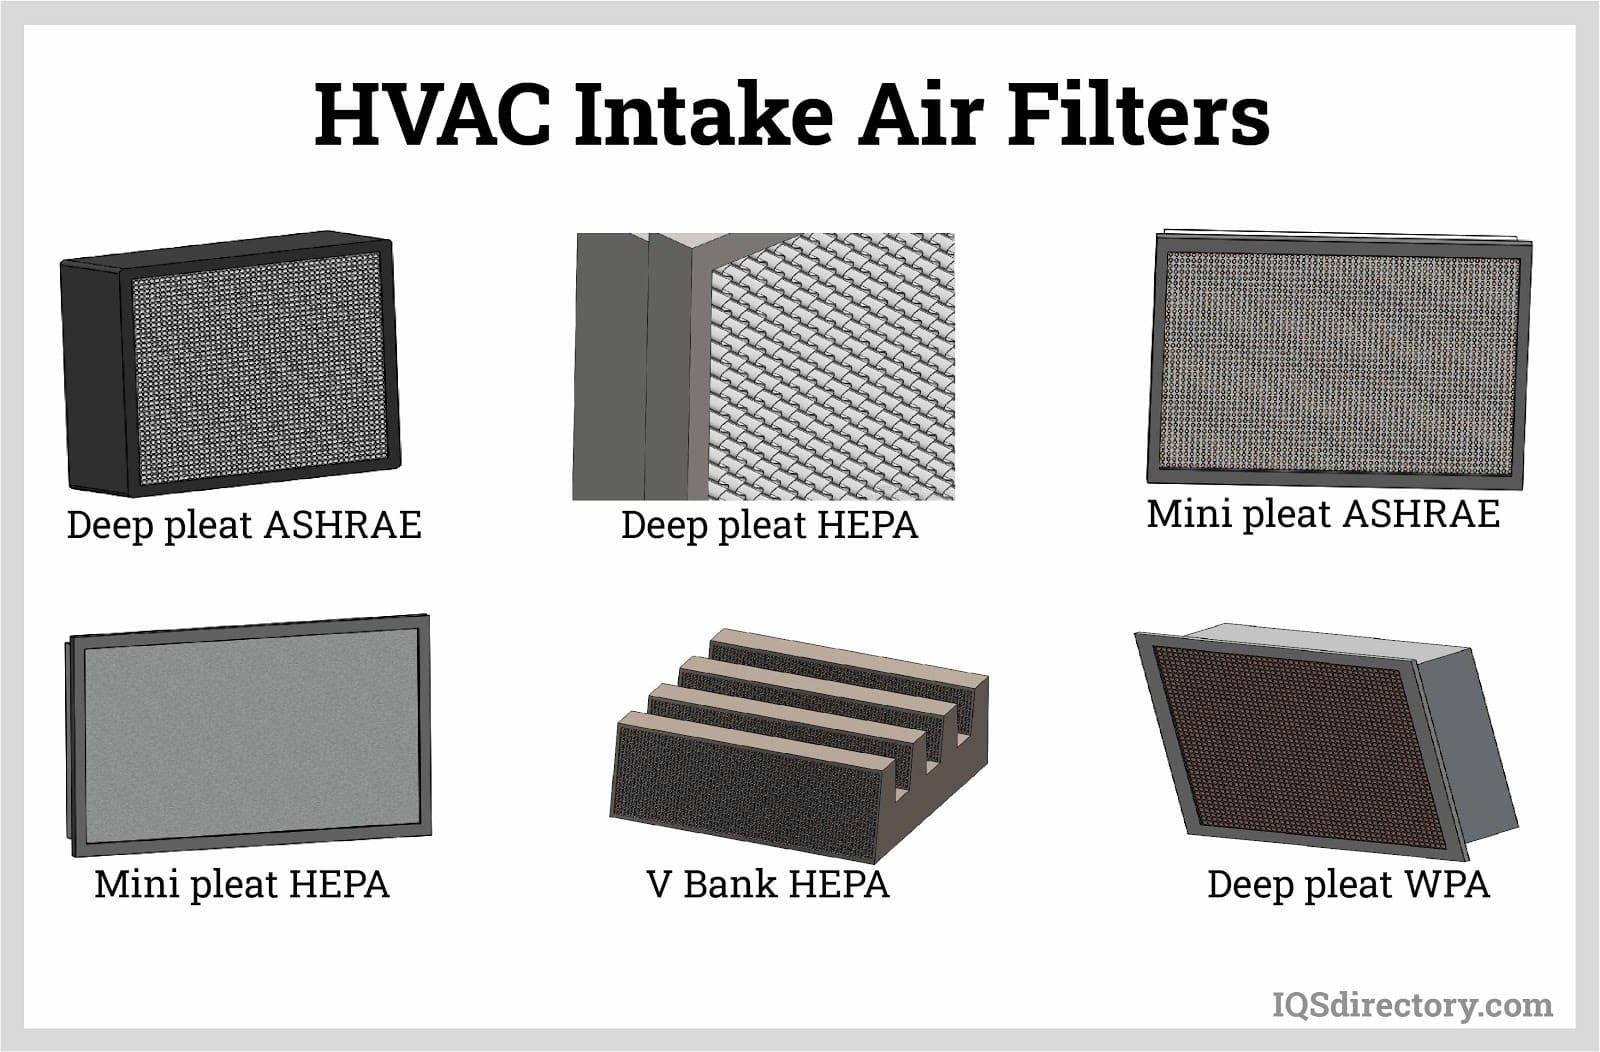 HVAC Intake Air Filters